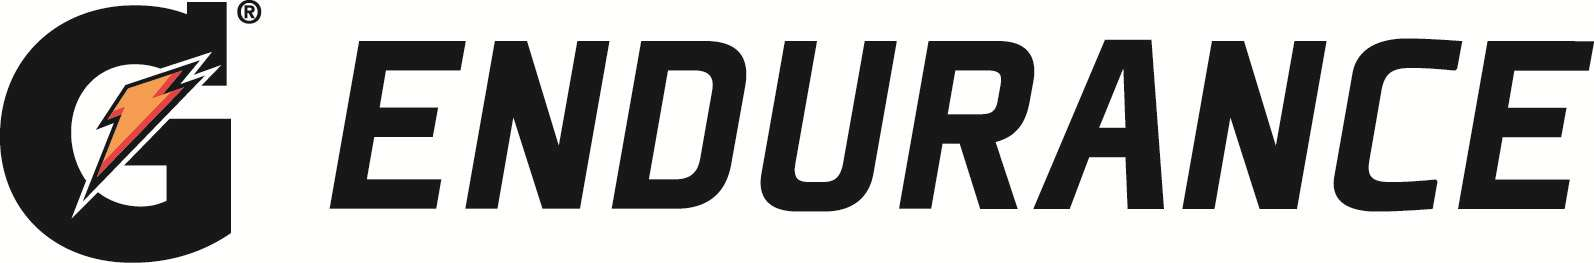 gatorade-endurance-logo.jpg